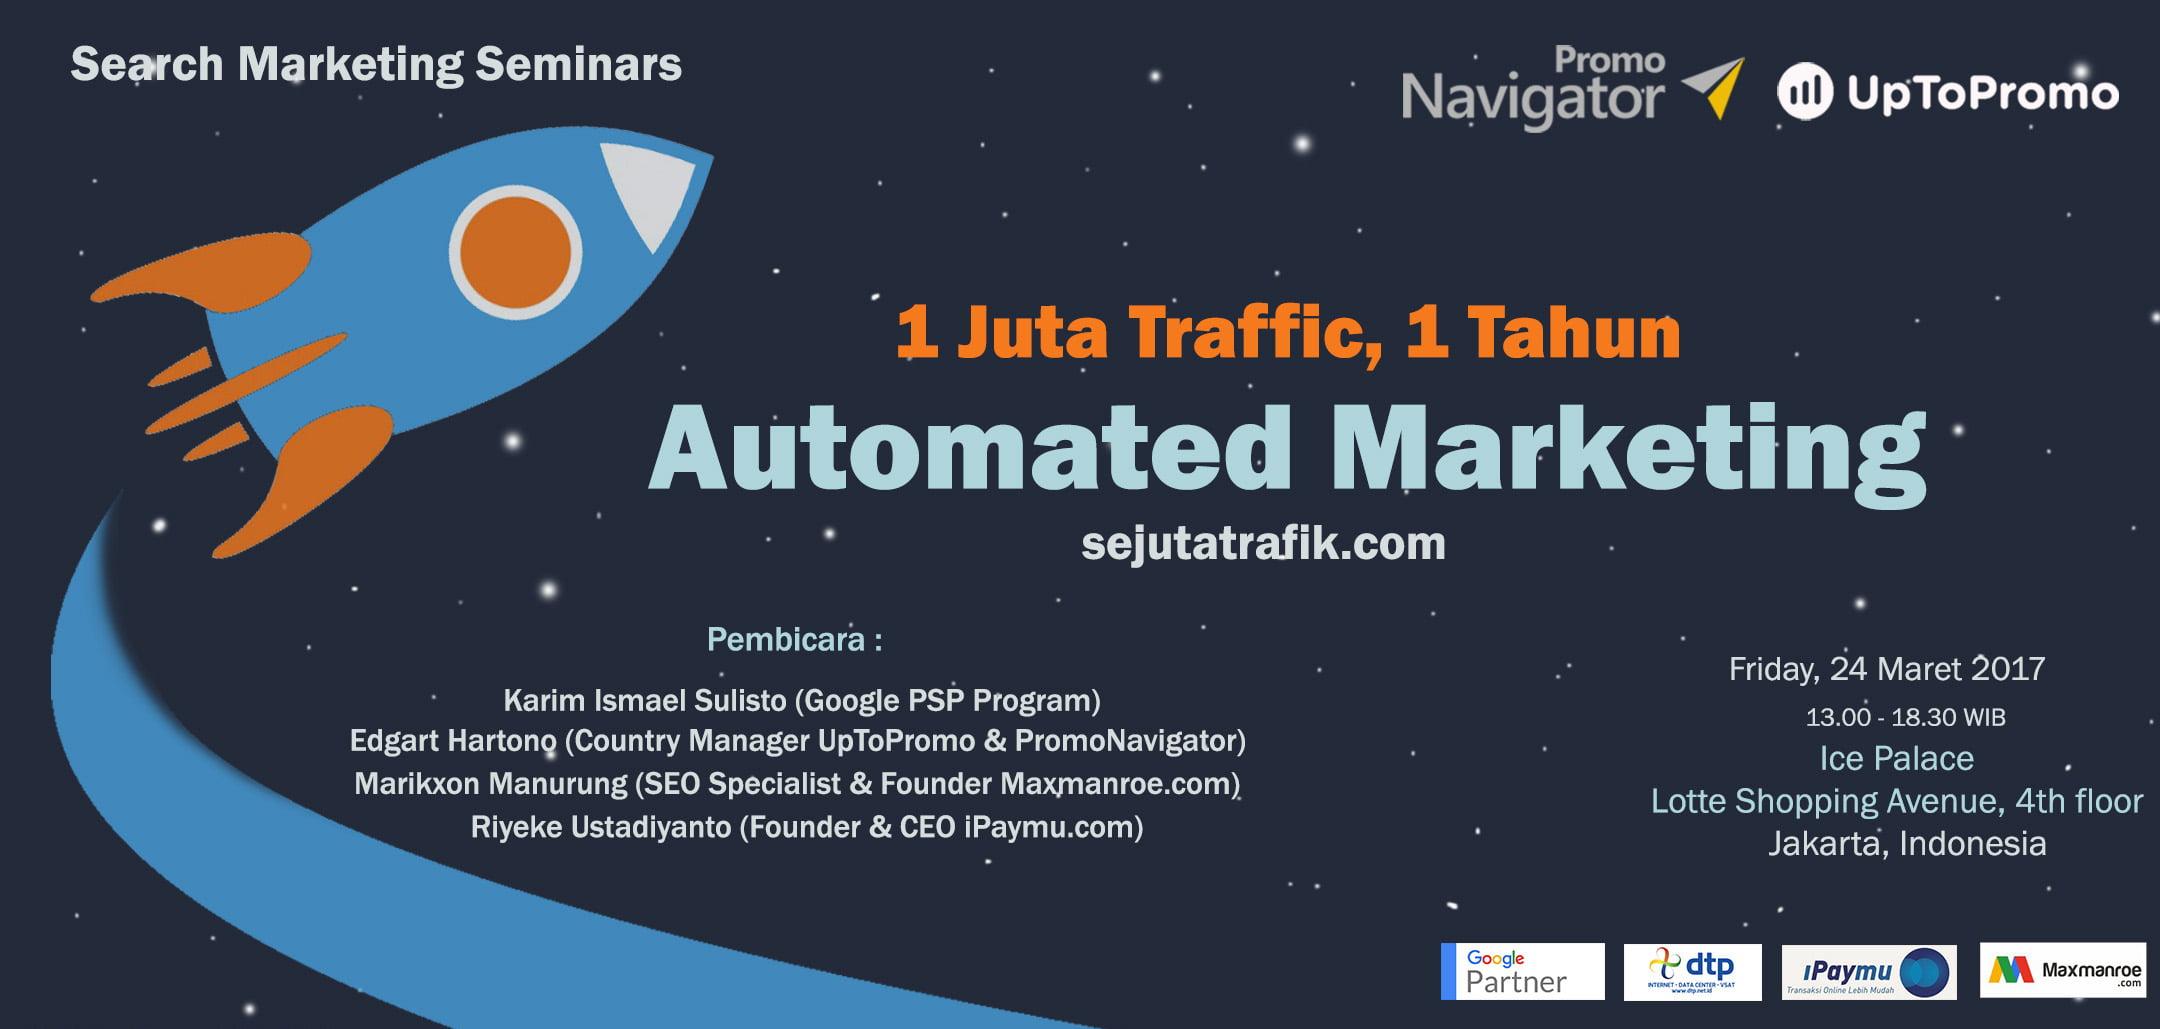 Seminar-Search-Engine-Automated-Marketing-1-Juta-Traffic-1-Tahun-1